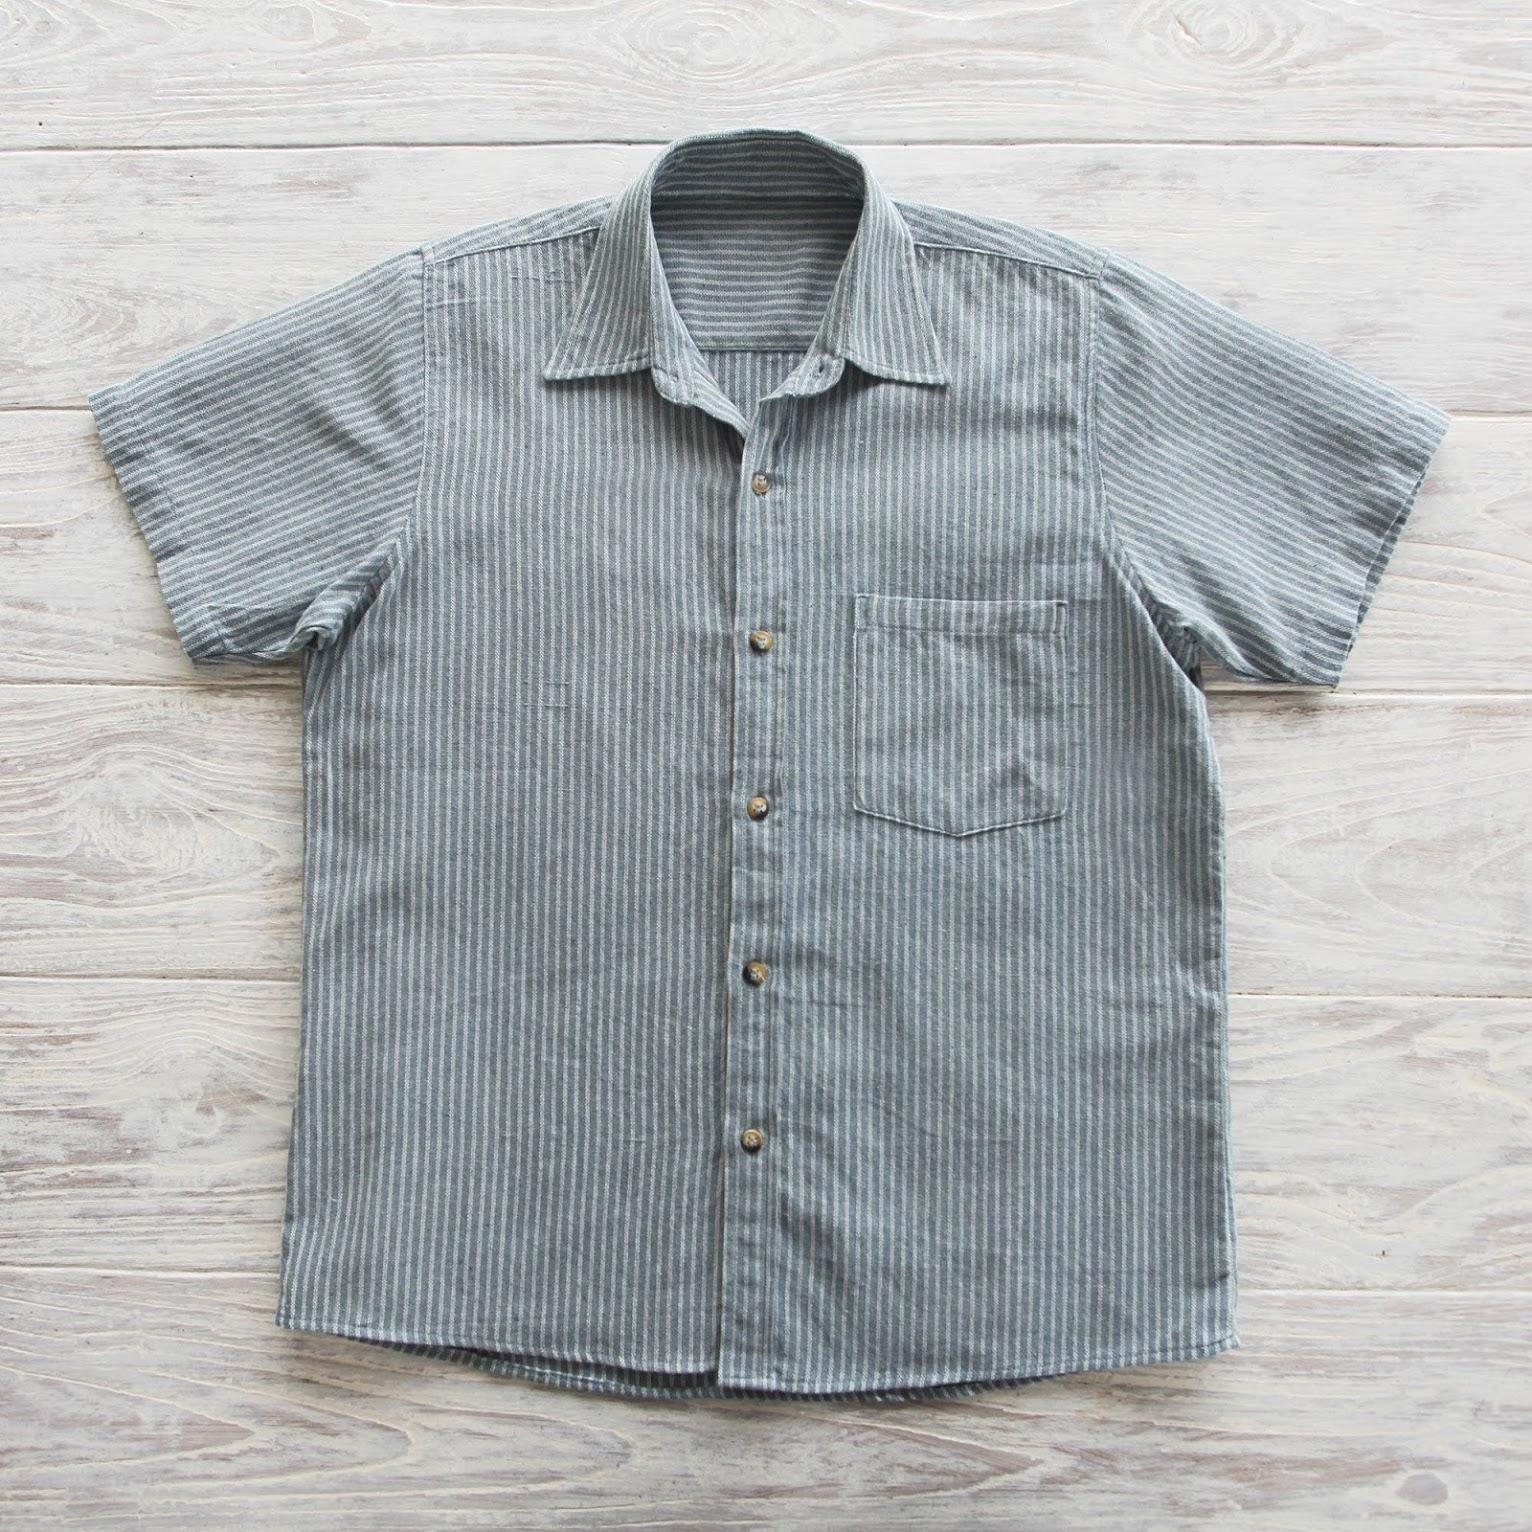 https://www.novica.com/p/blue-striped-short-sleeved-mens-cotton/325657/